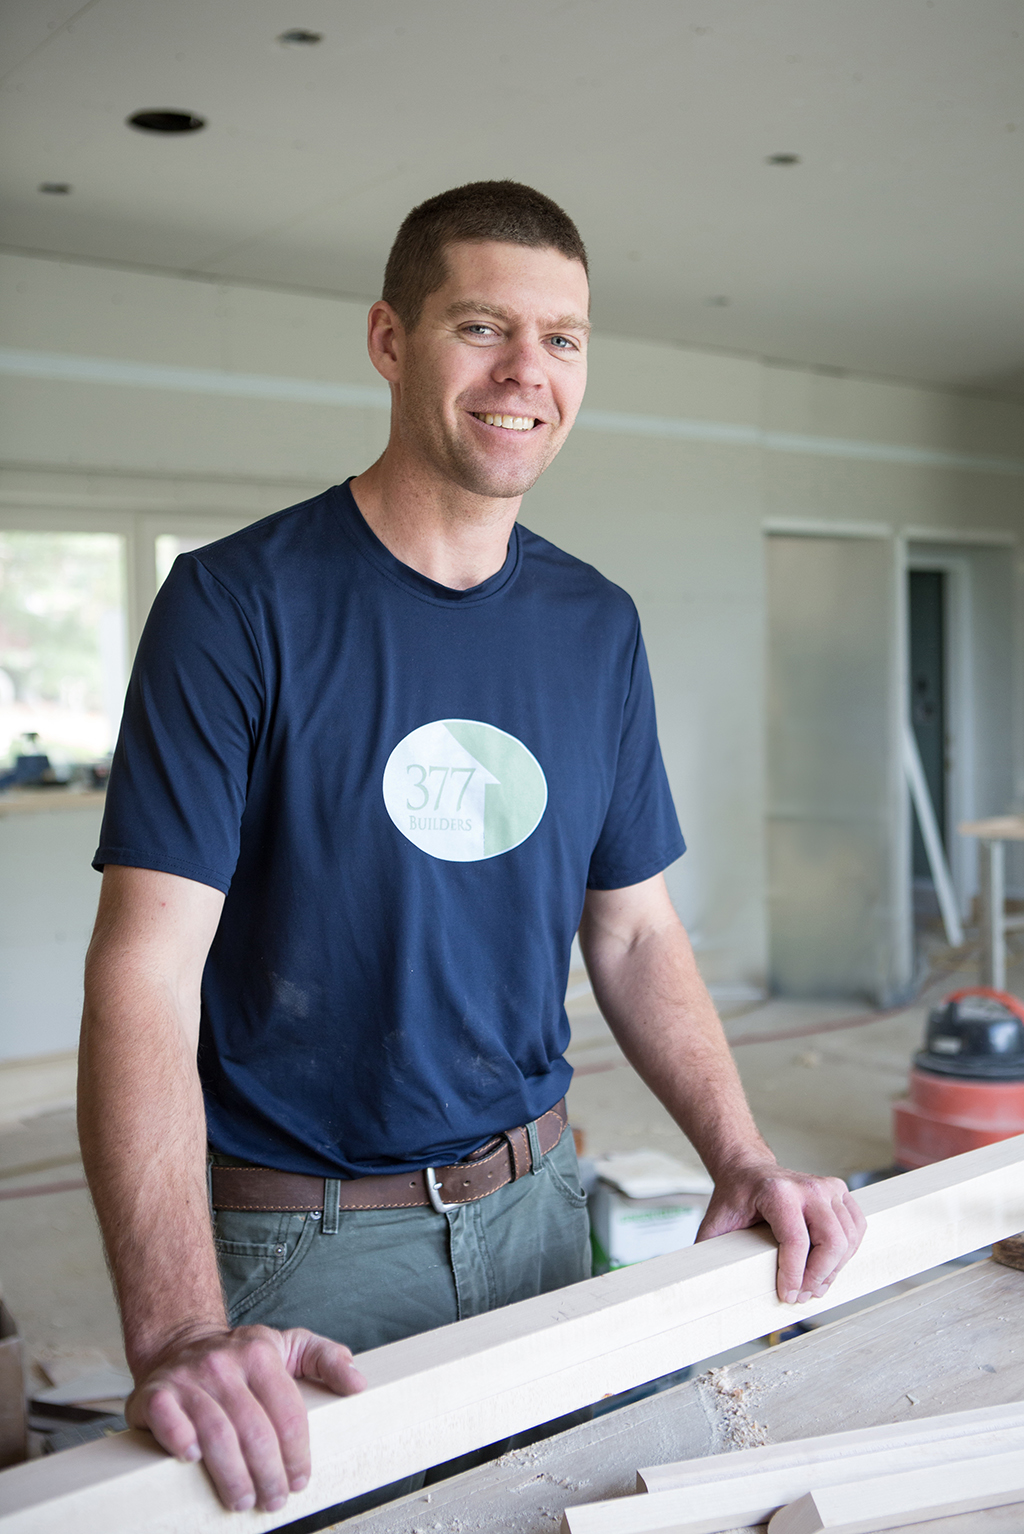 Andy Brazie, Employee